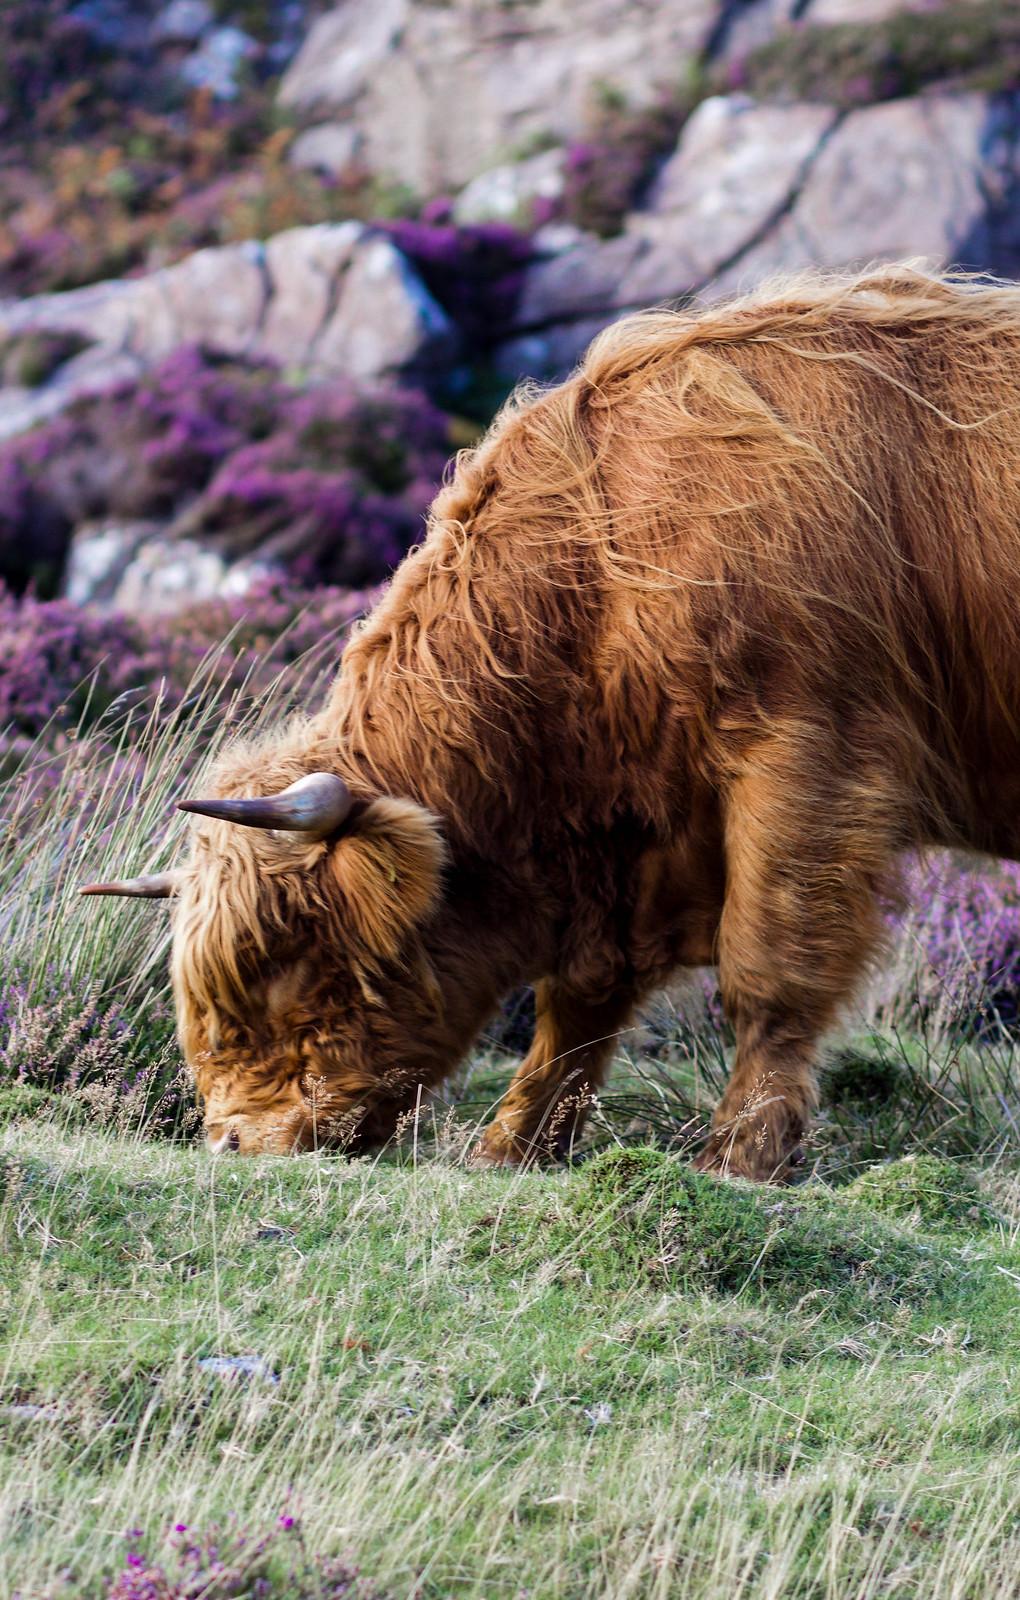 Applecross Peninsula Scotland NC500 Route highland cow travel blogger UK